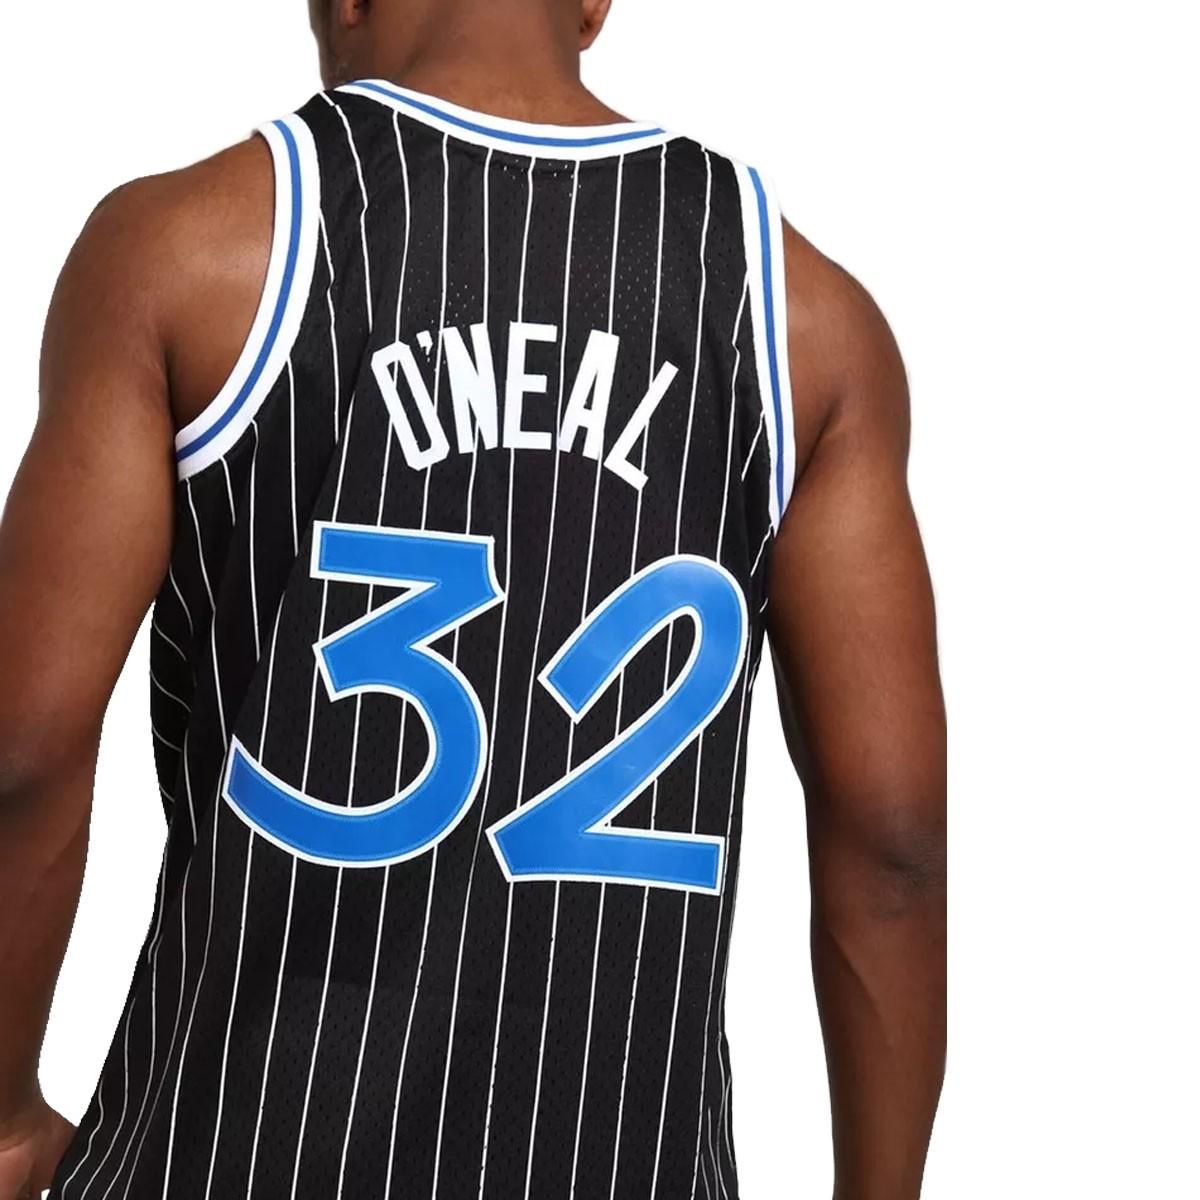 Mitchell & Ness O'Neal Swingman Jersey 'Orlando' SMJYGS18191